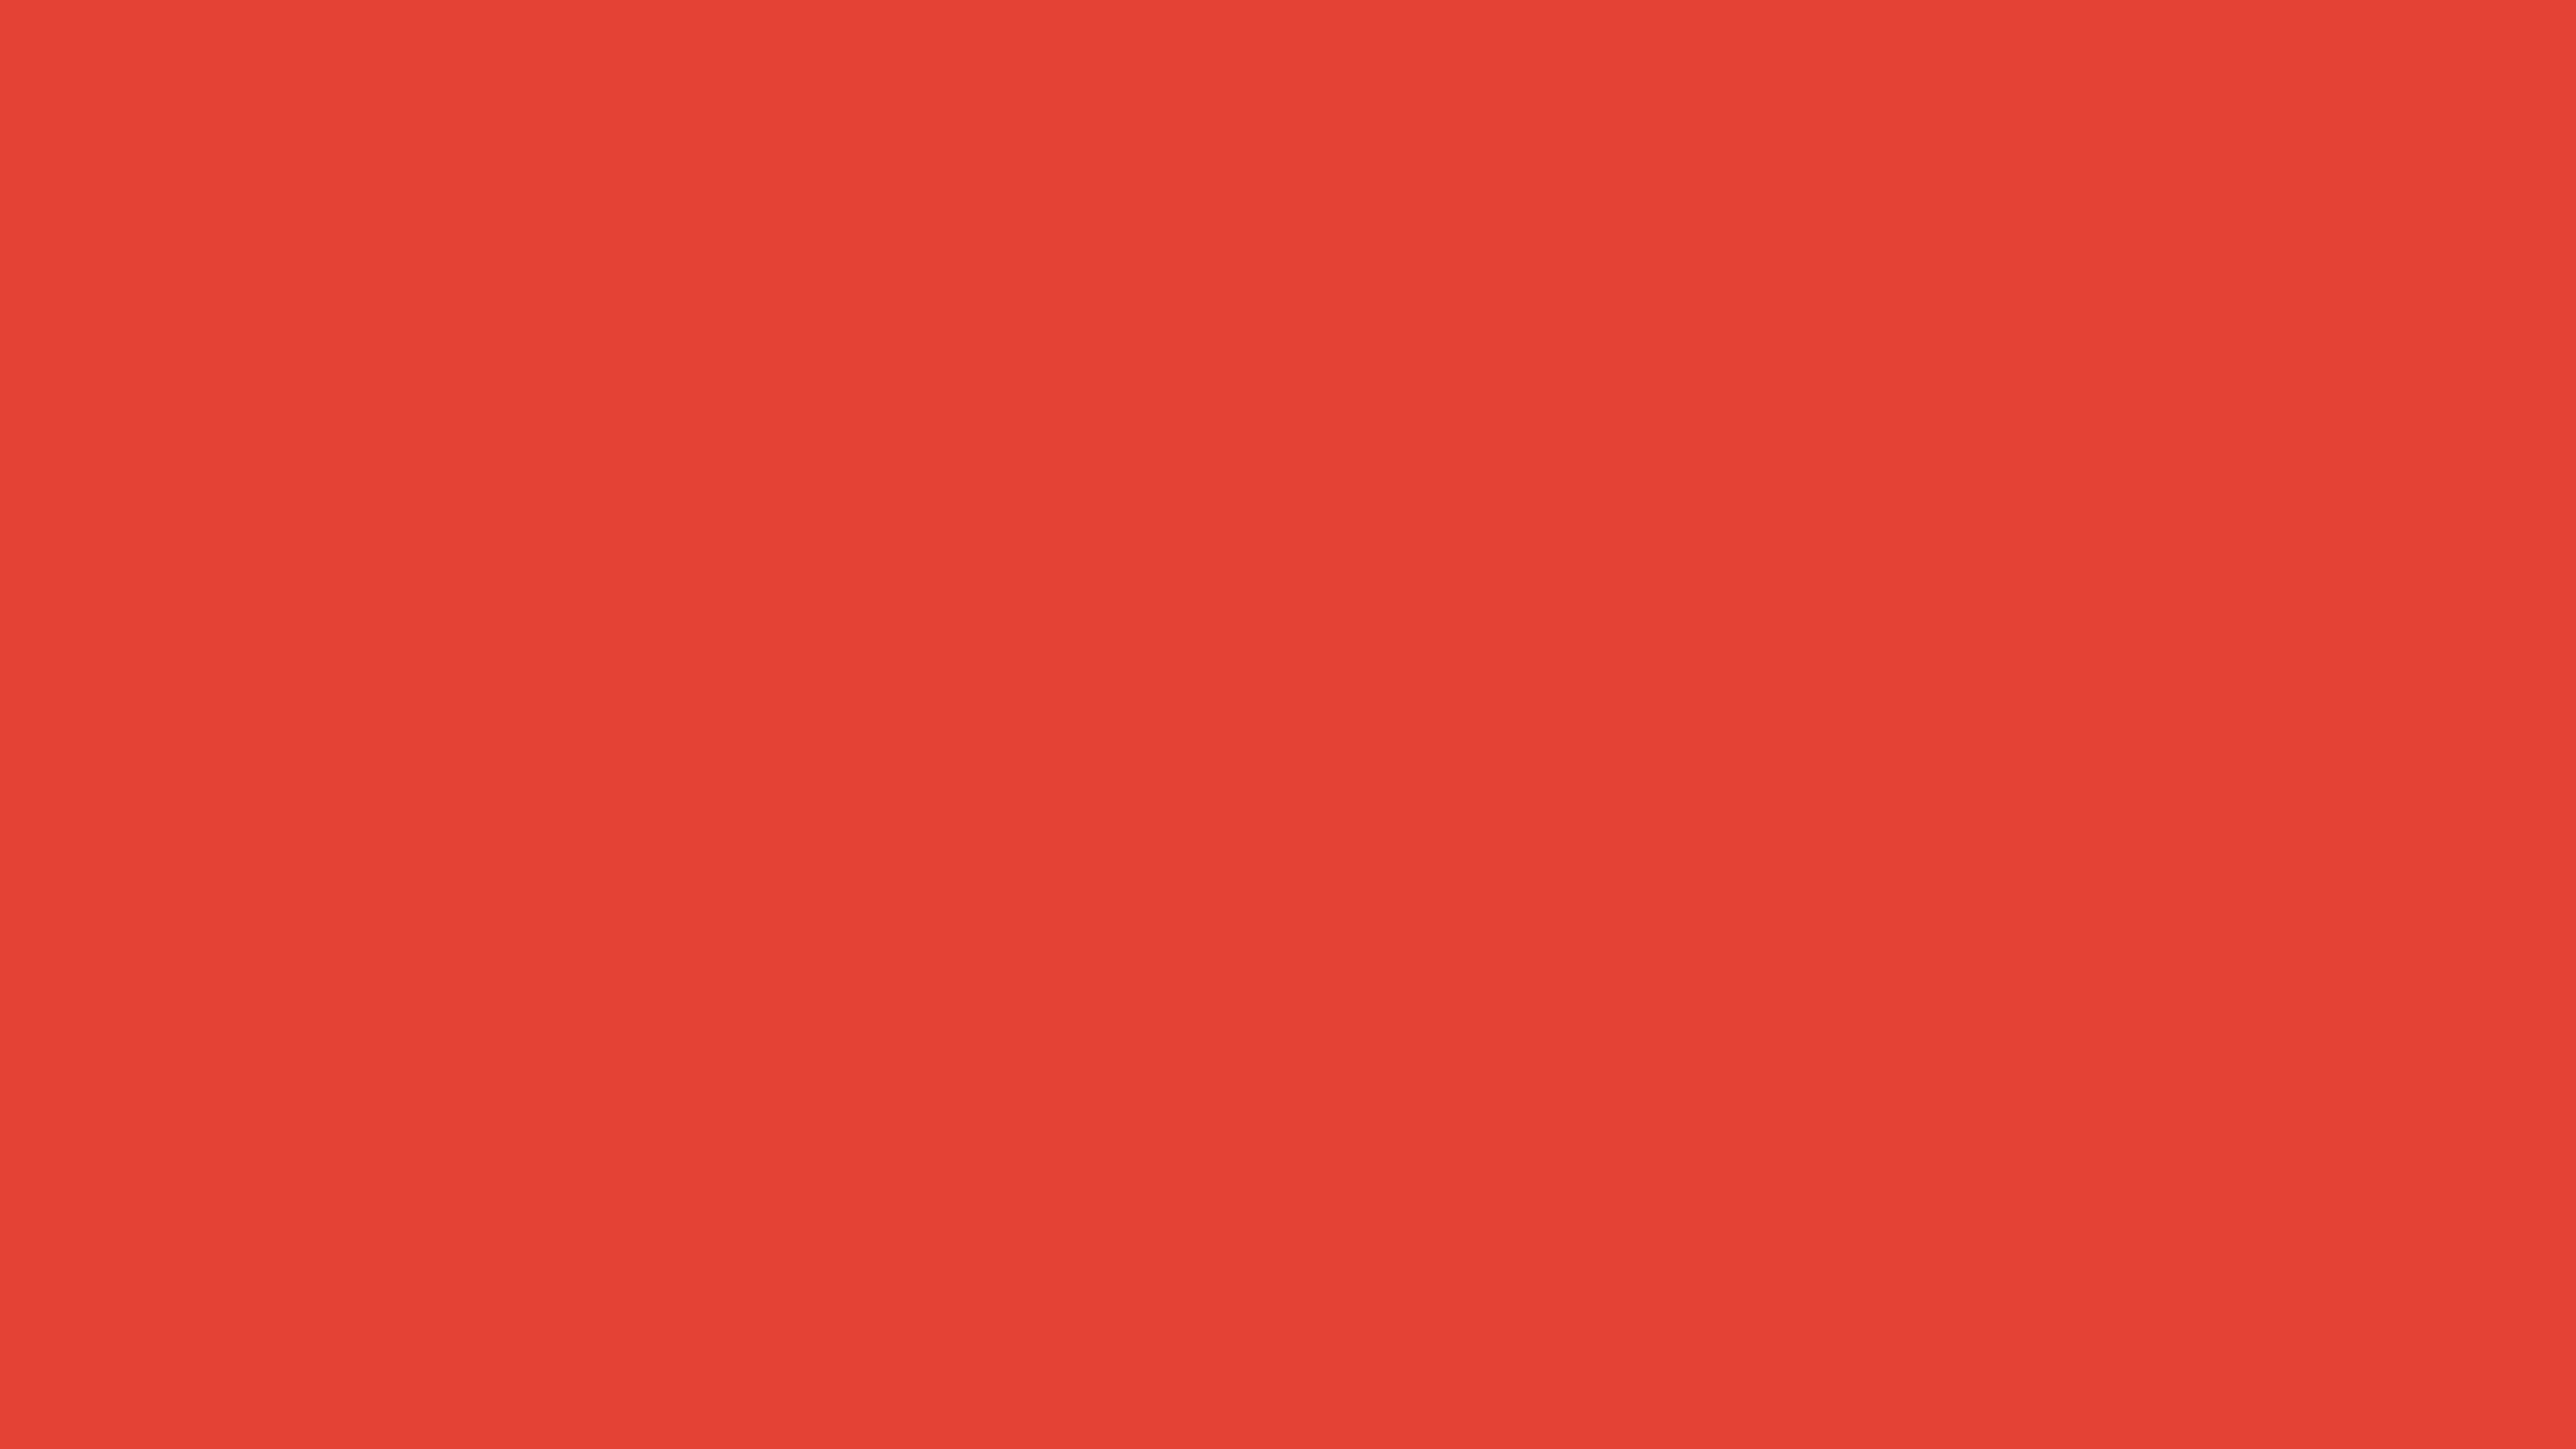 3840x2160 Vermilion Cinnabar Solid Color Background